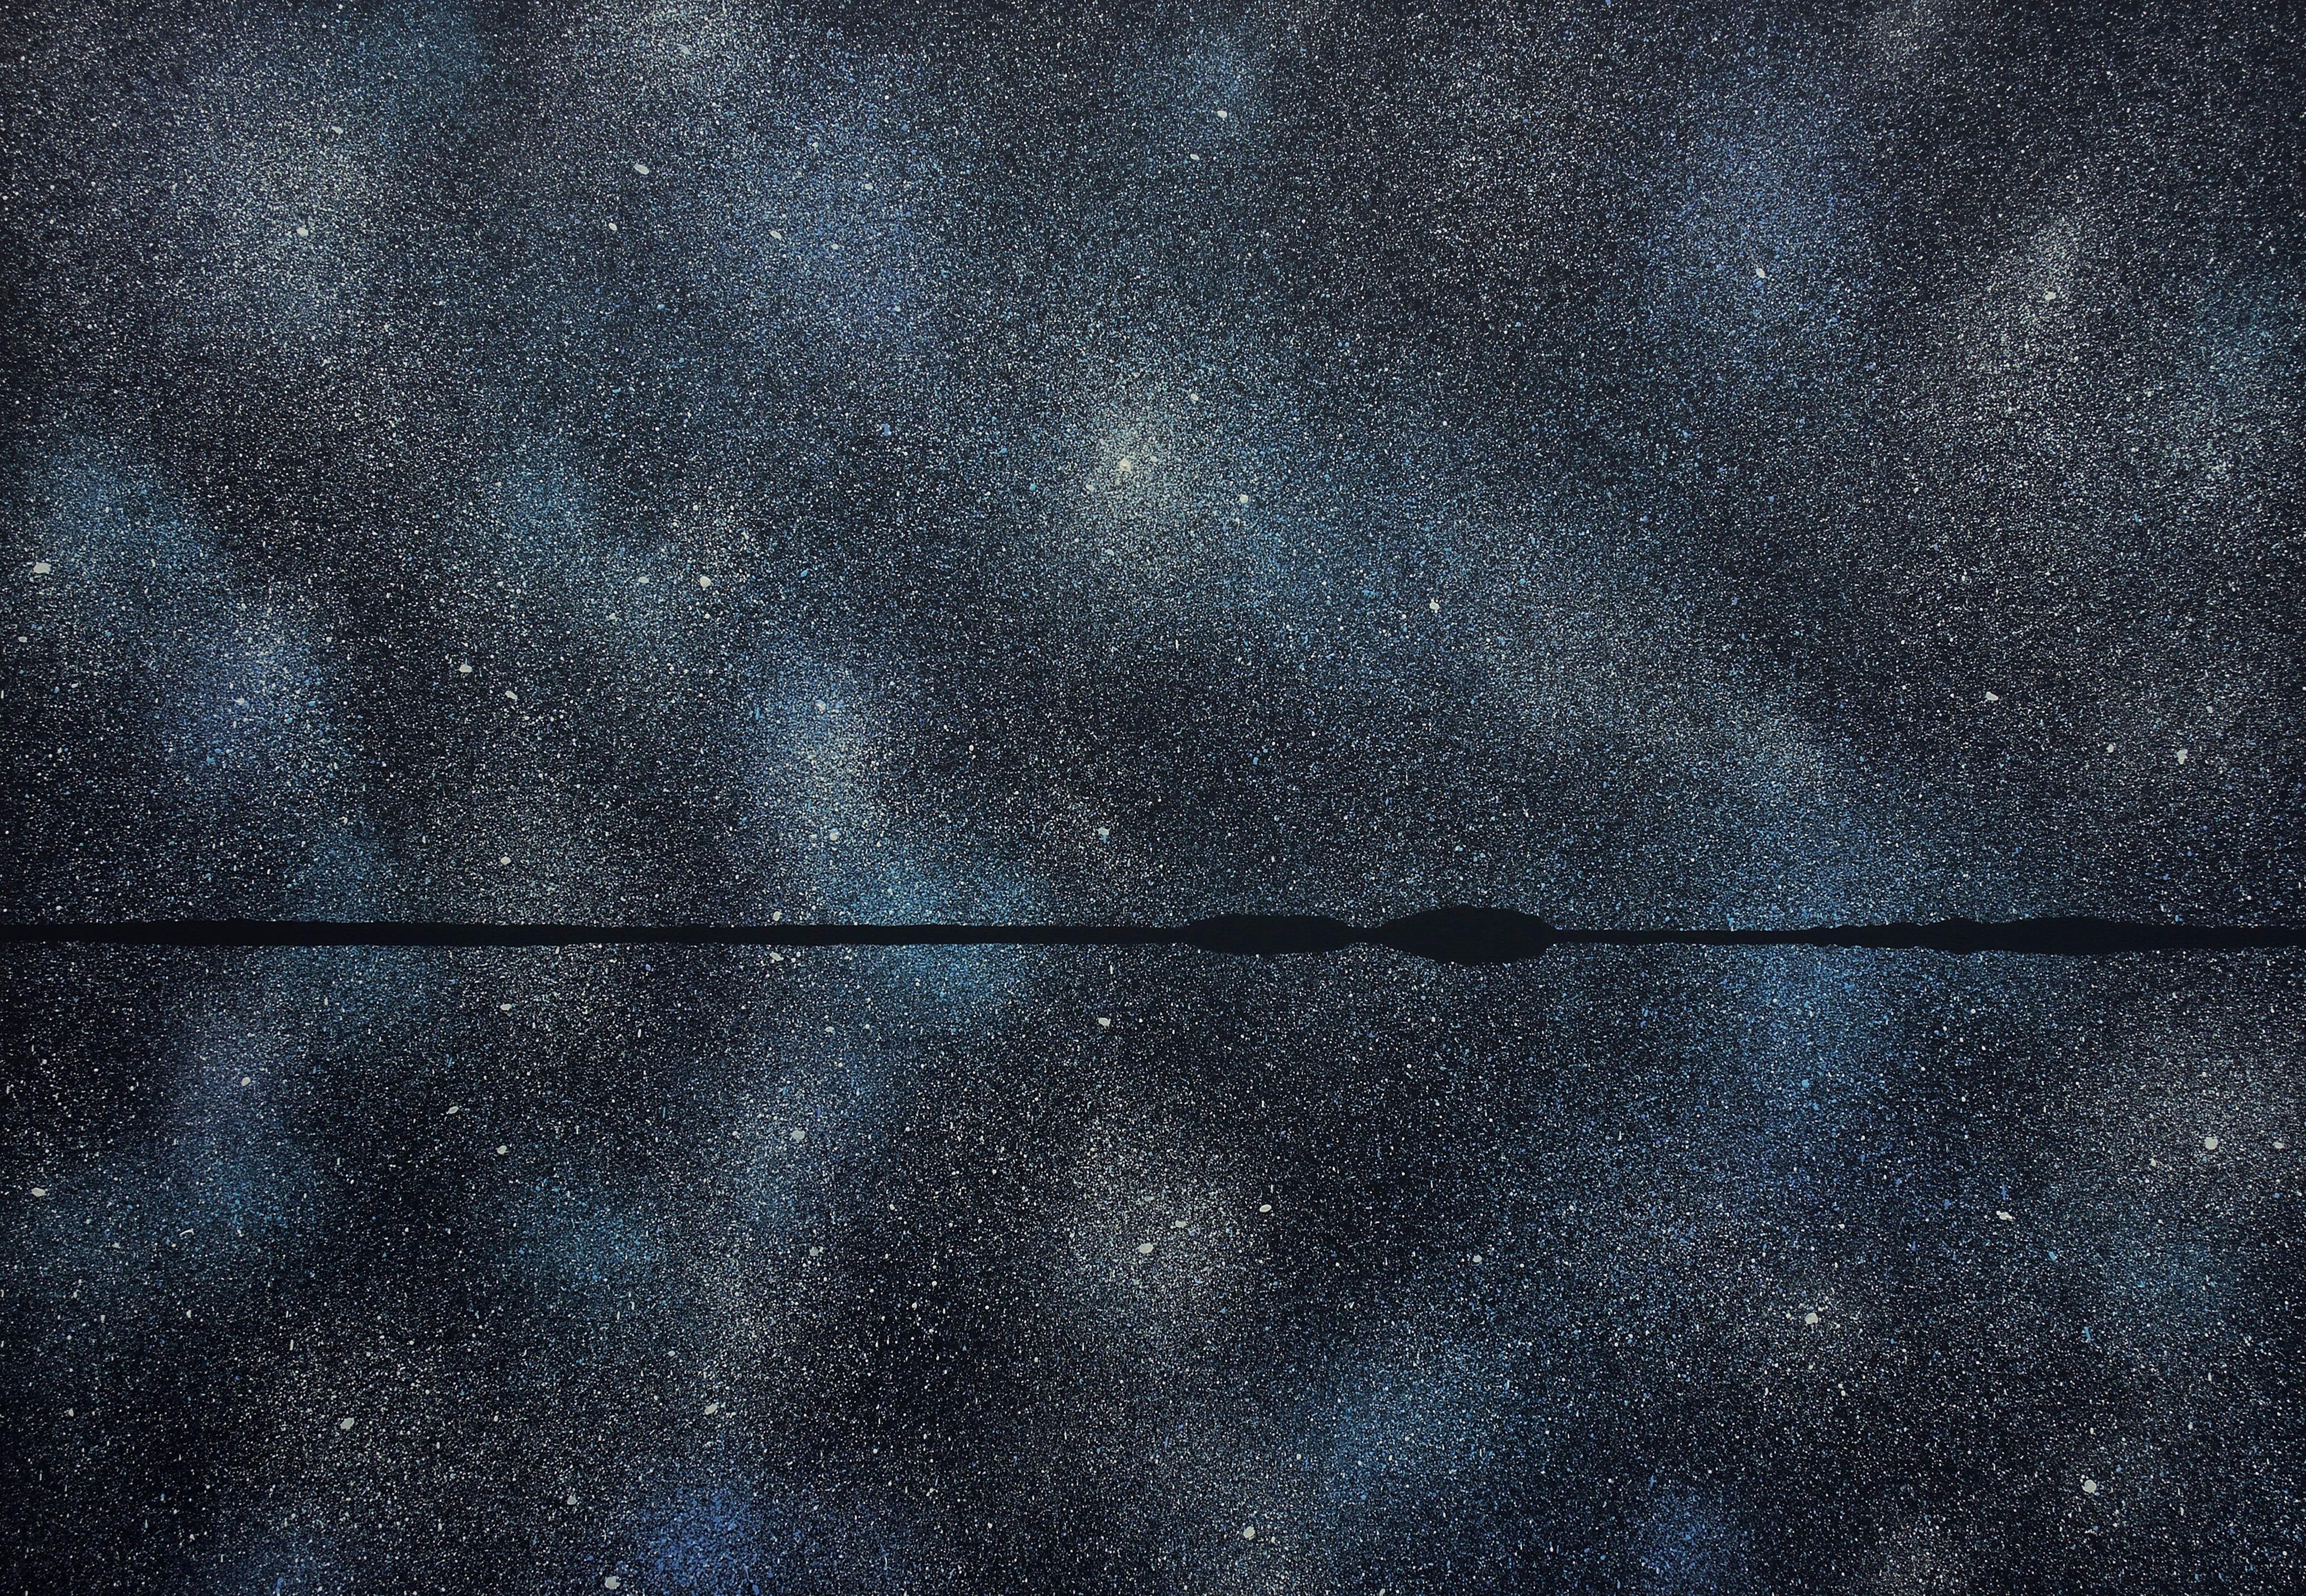 Stars 21 August 23:36, Modern Night Sky Landscape Painting, Minimalist Art